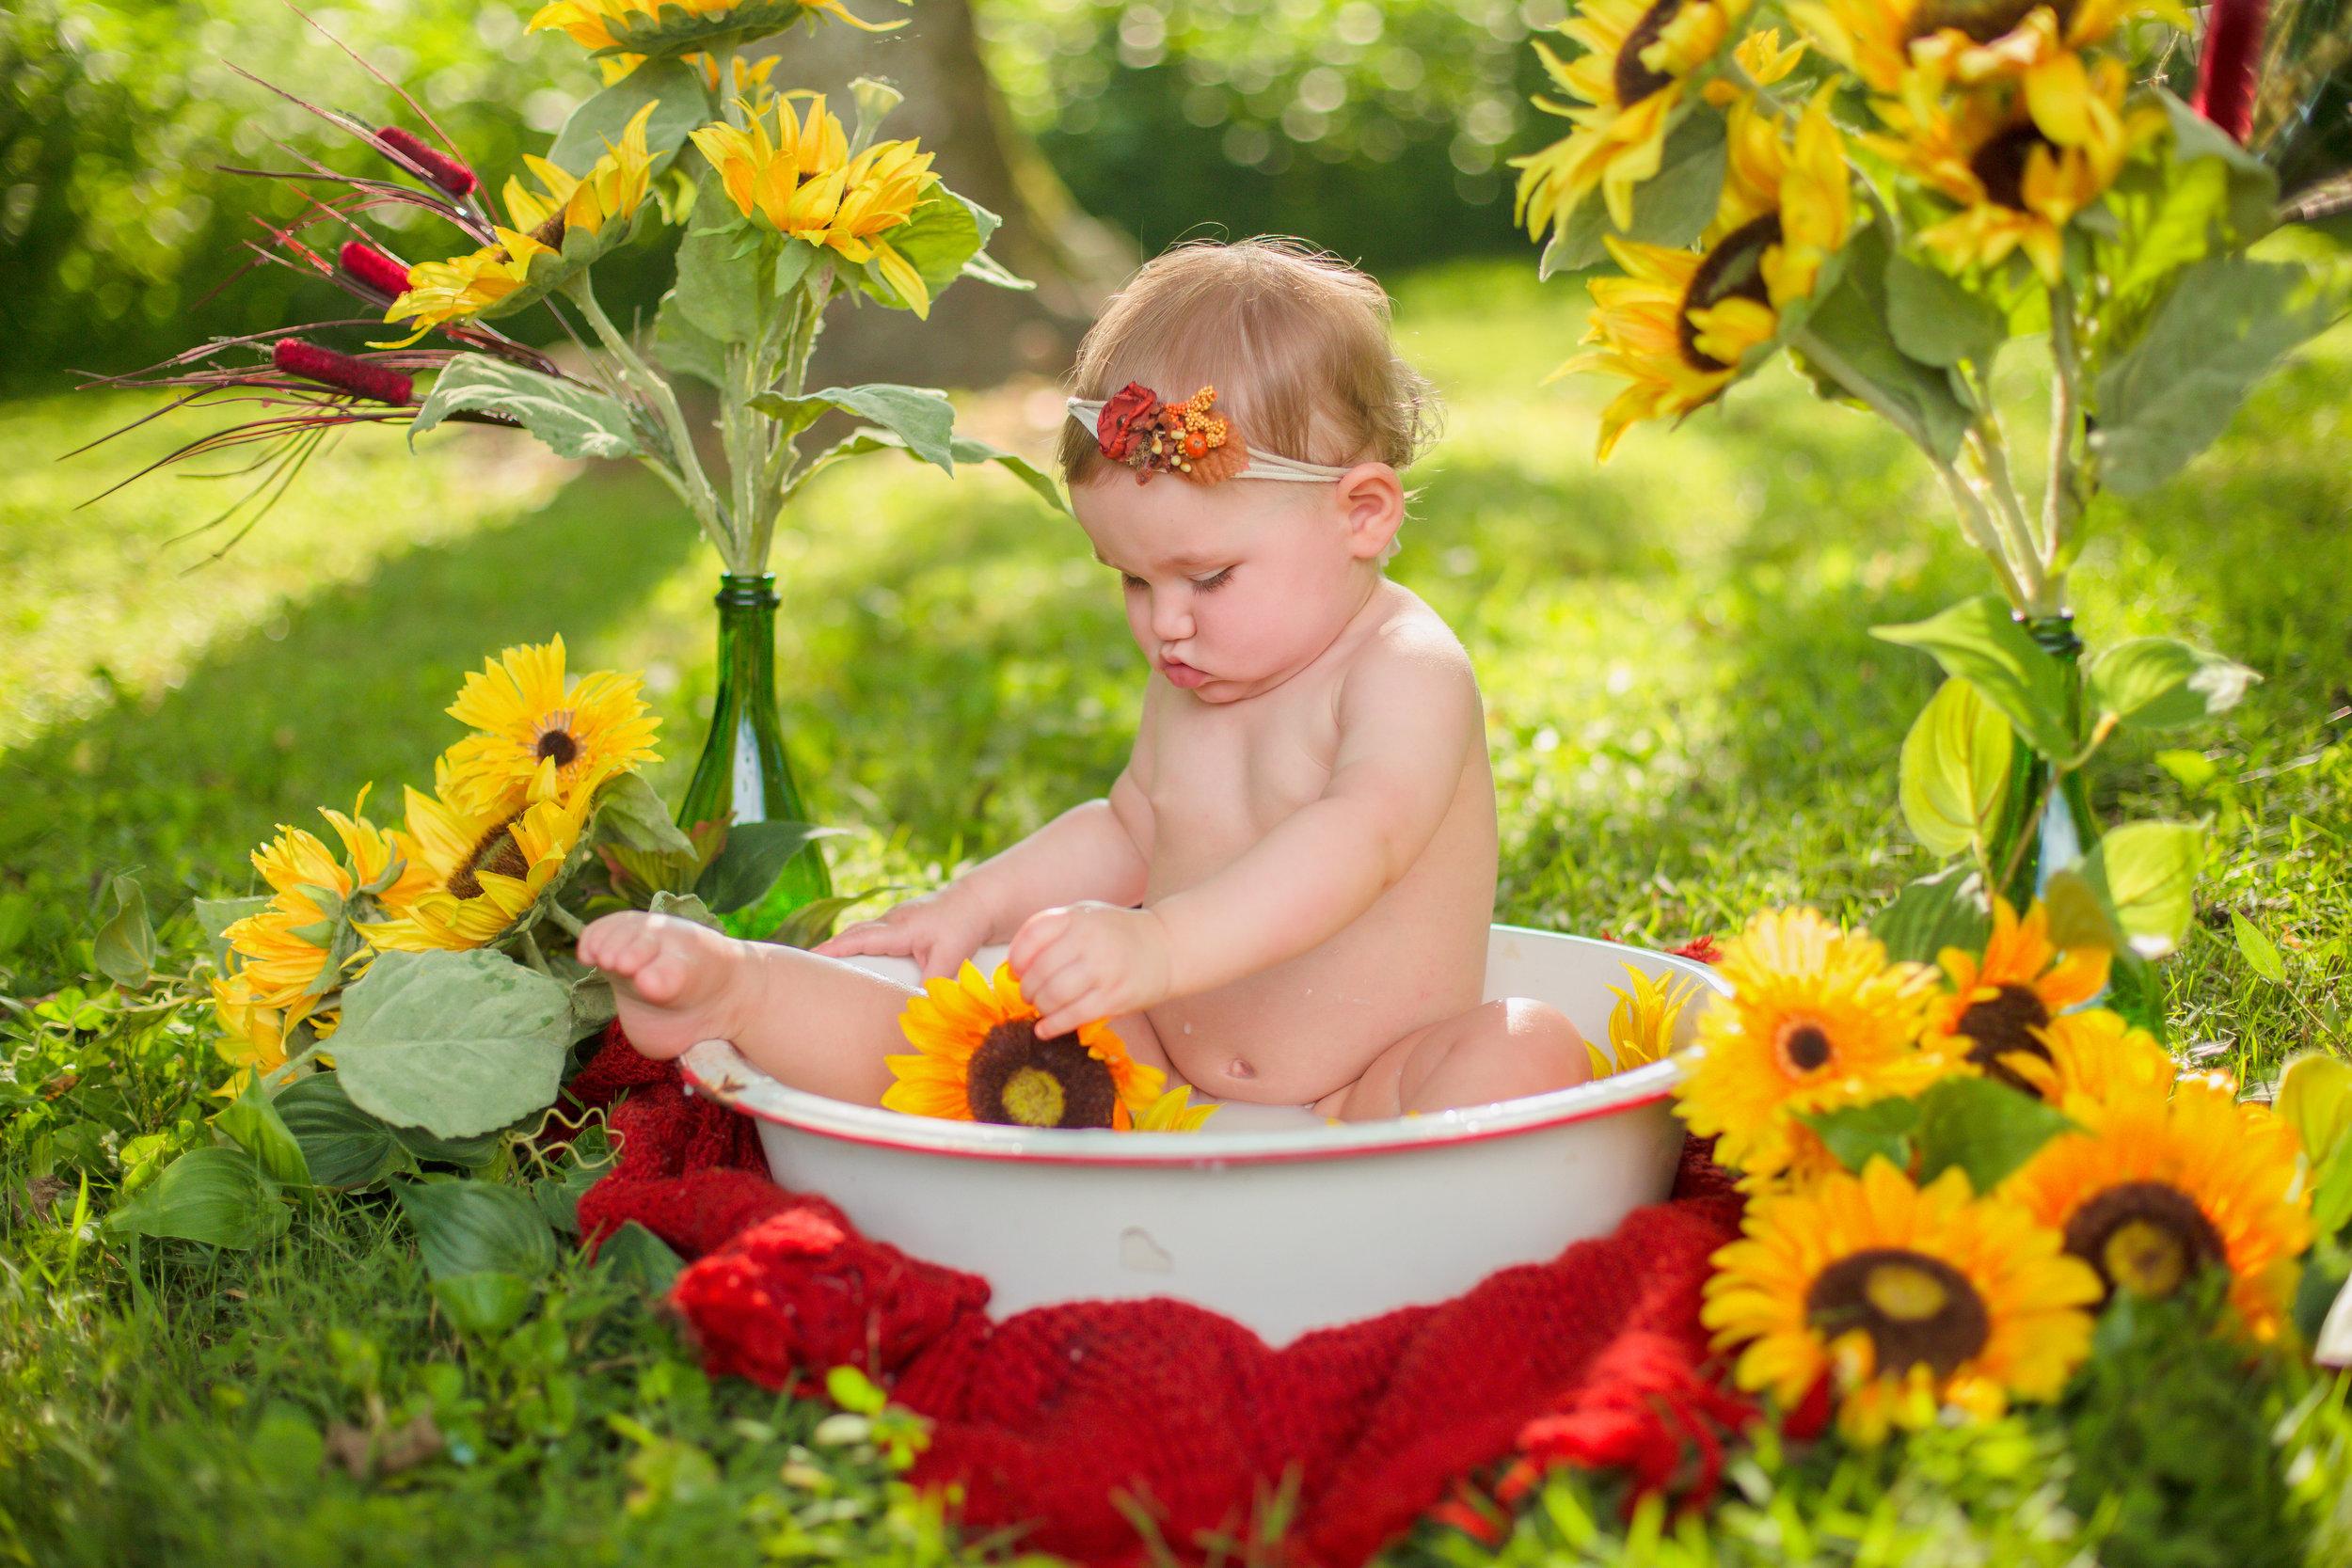 Sawyer-Jo-Sunflower-Milk-bath-Nashville-Family-Photographer-Chelsea-Meadows-Photography-(24).jpg